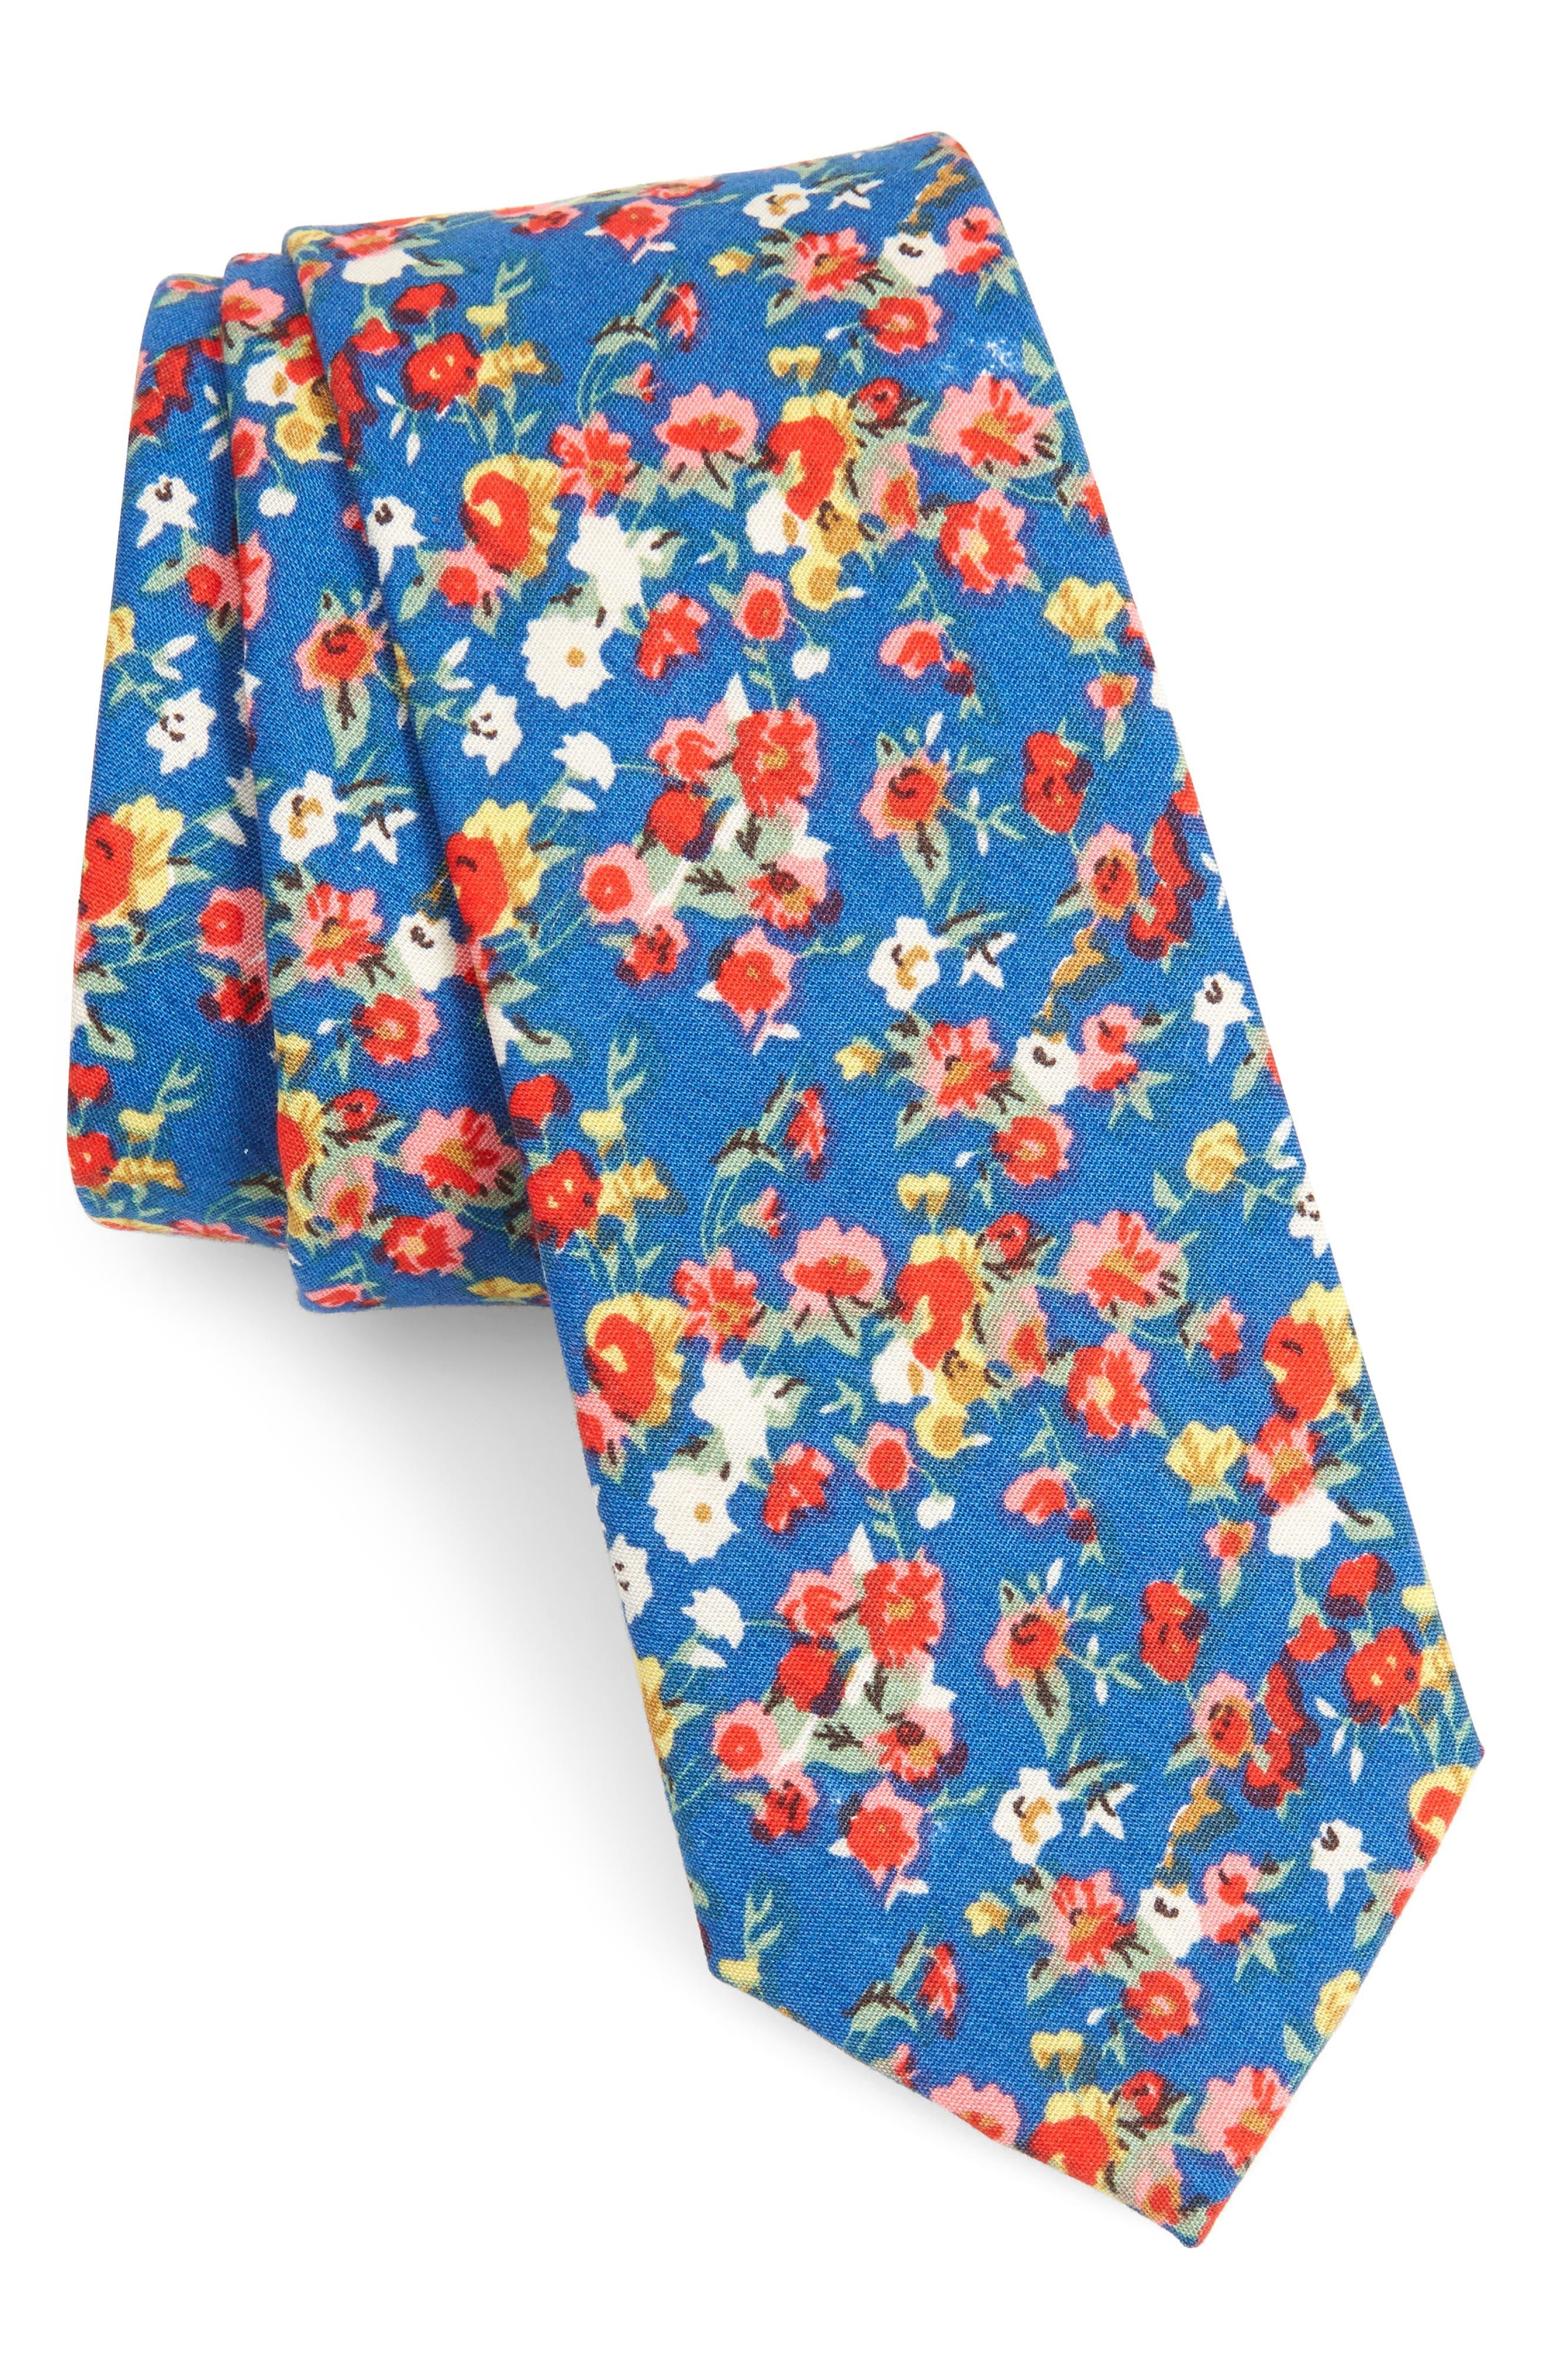 Ager Floral Cotton Tie,                         Main,                         color, NAVY